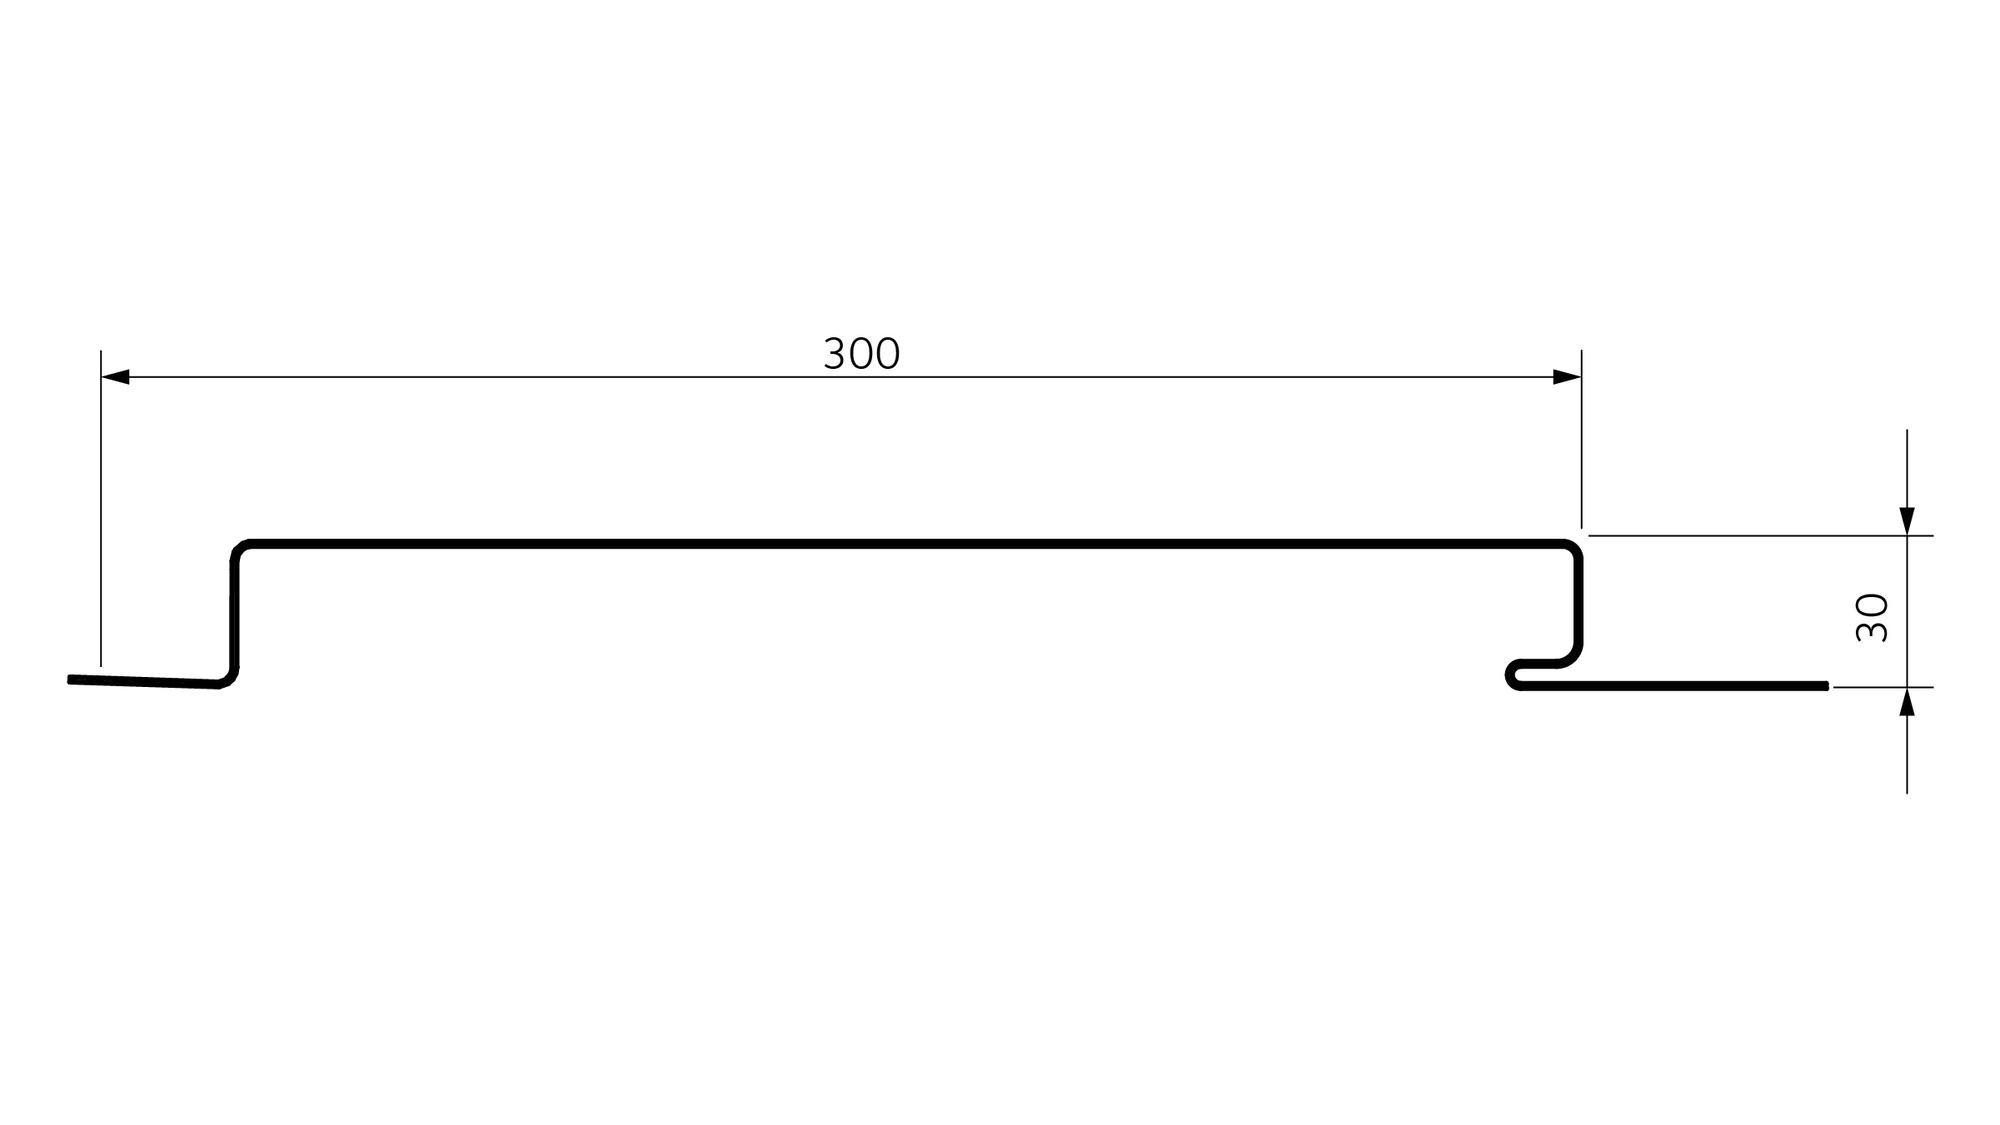 ST300 type JCD